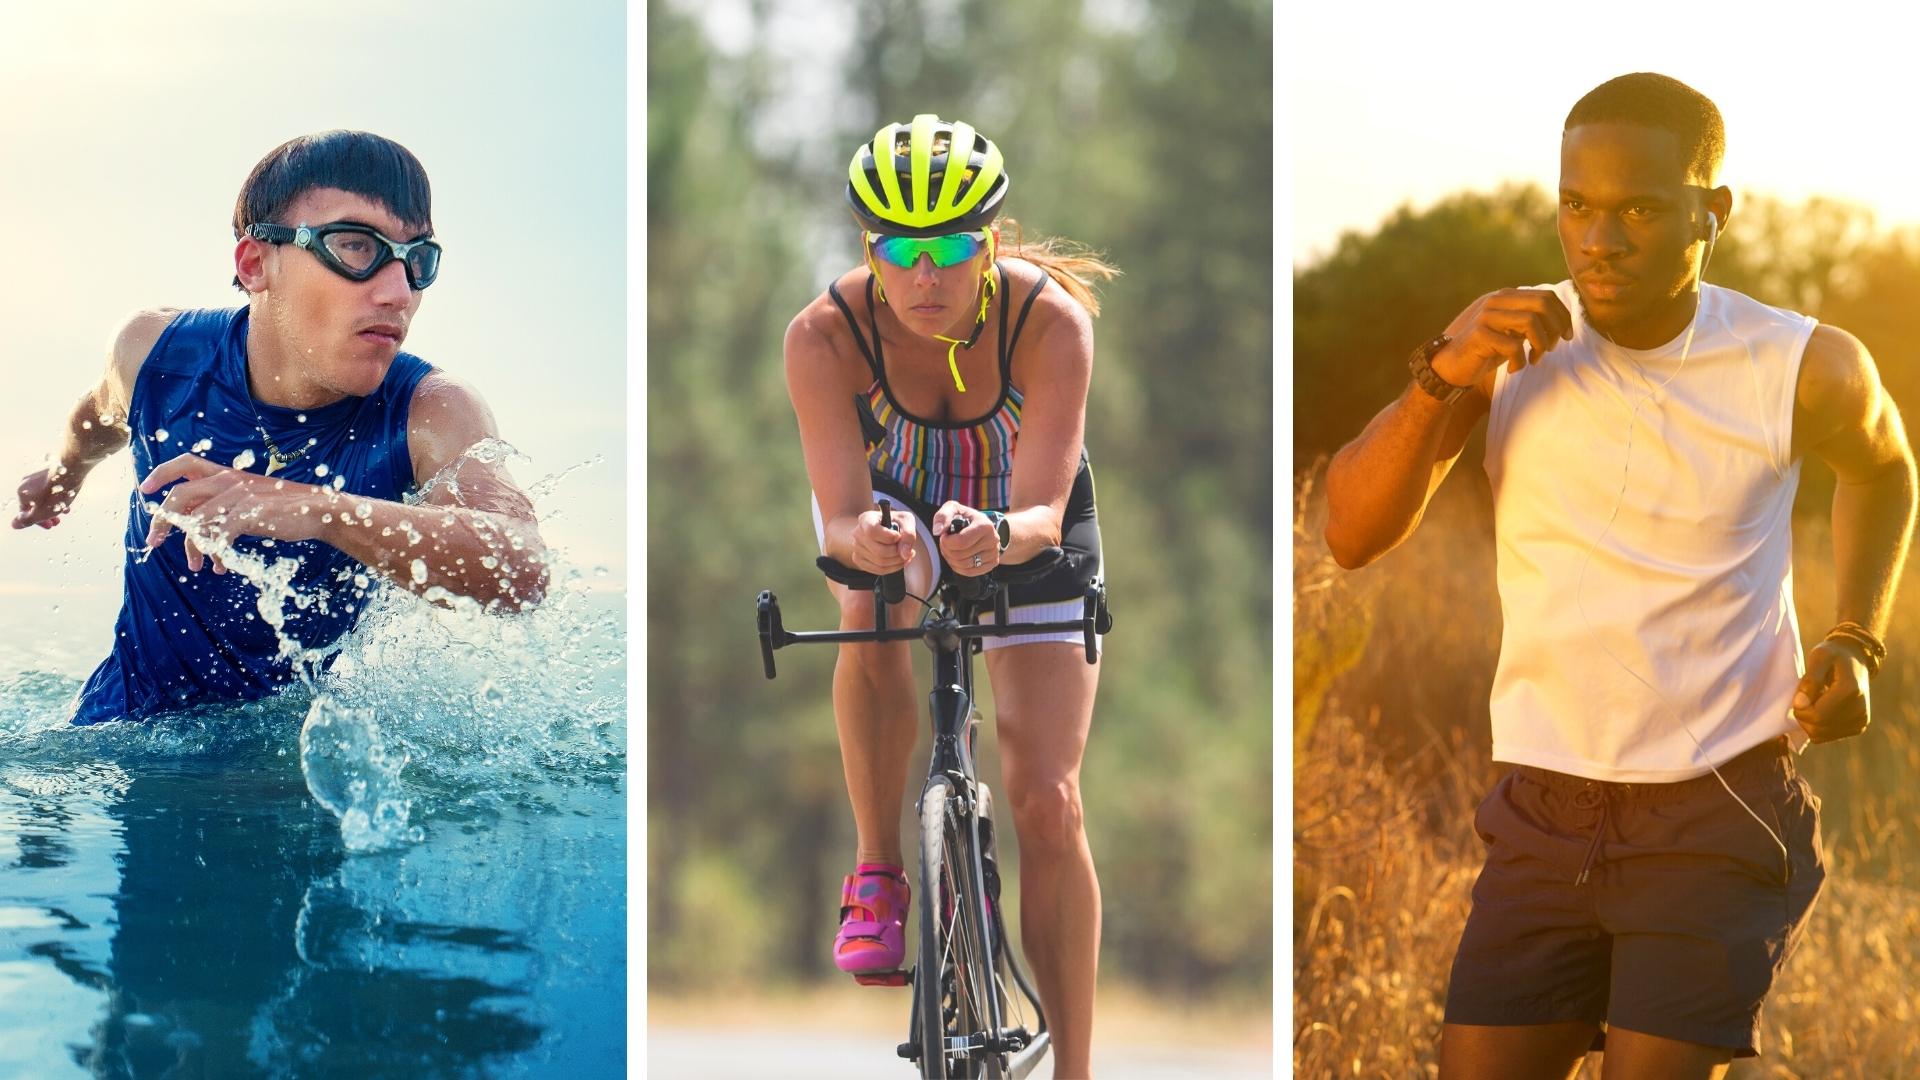 Kiawah Island Triathlon - South Carolina